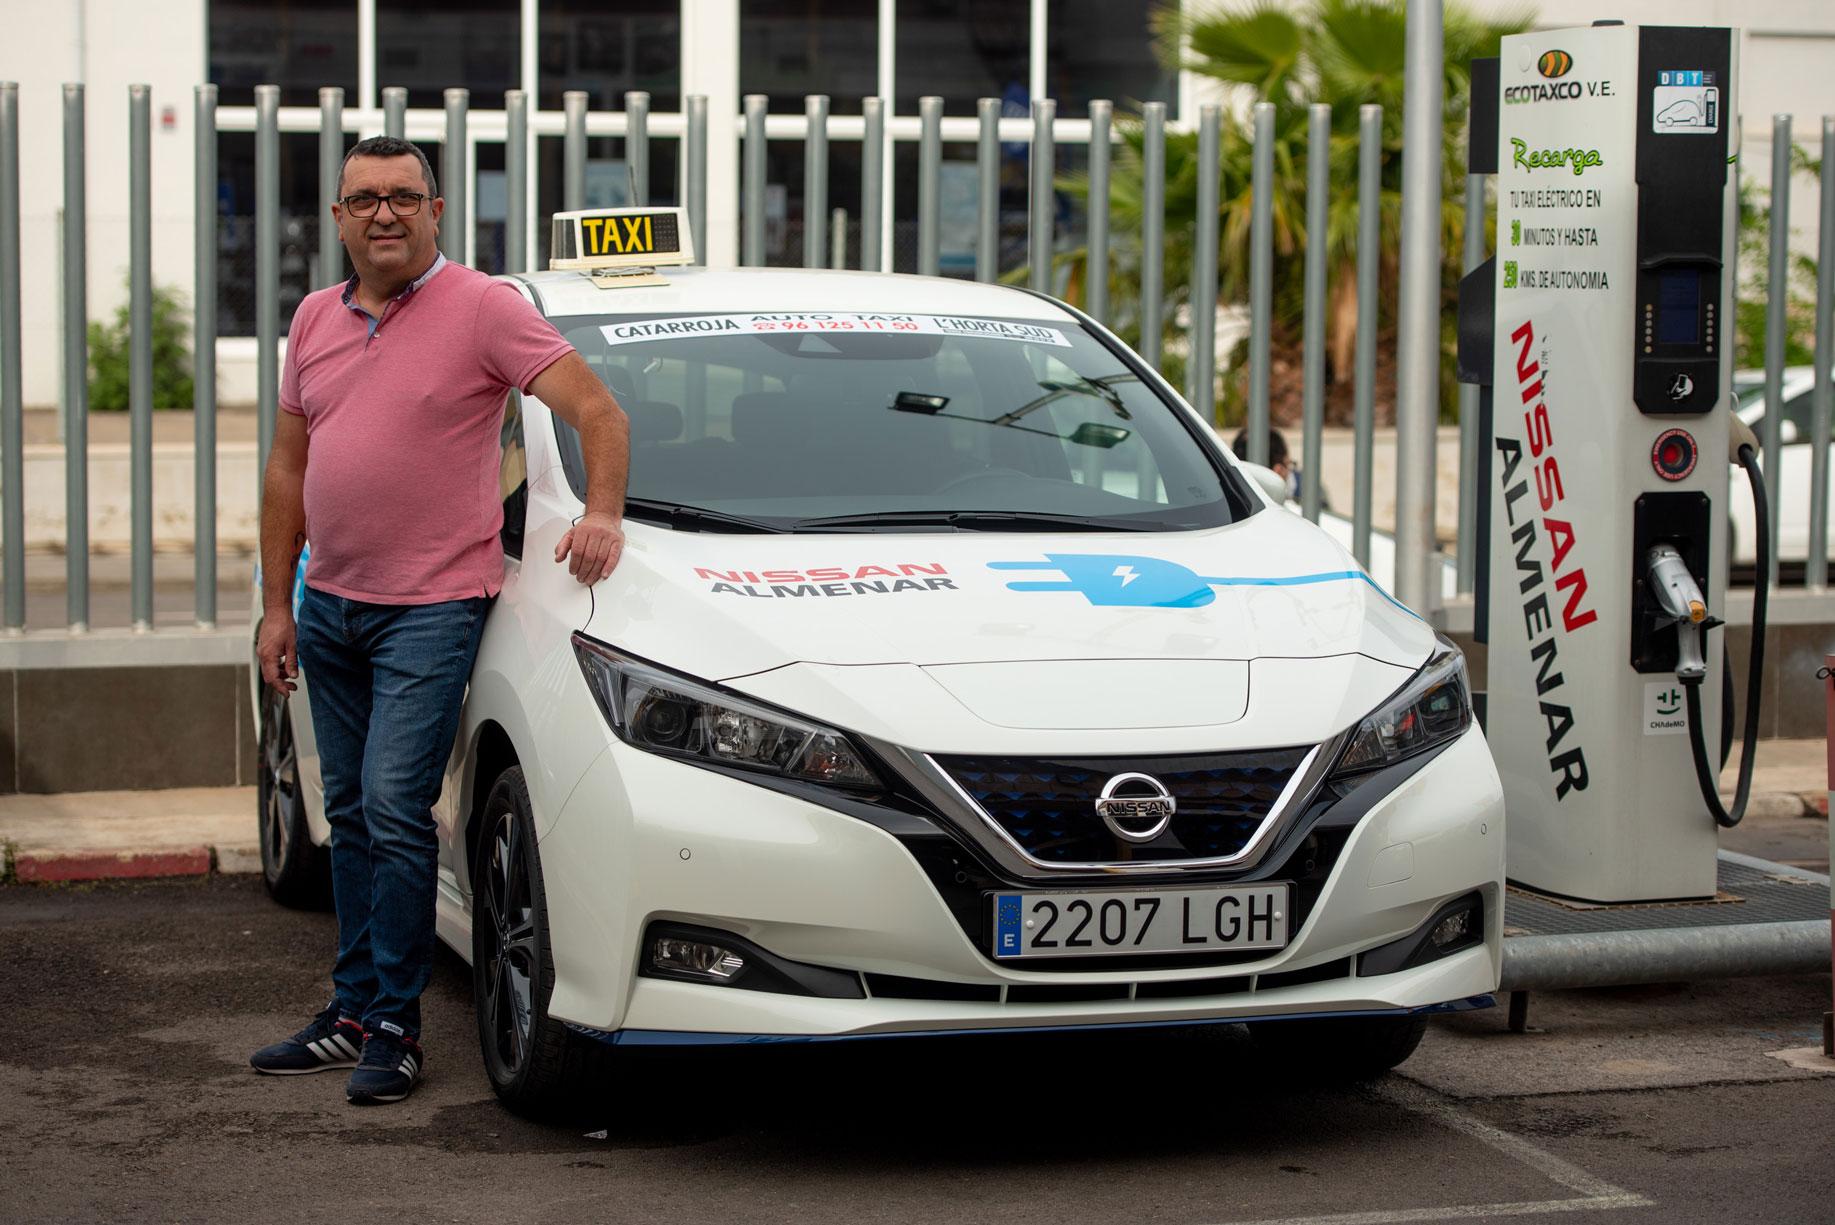 Javier Pérez y su taxi Nissan Leaf.